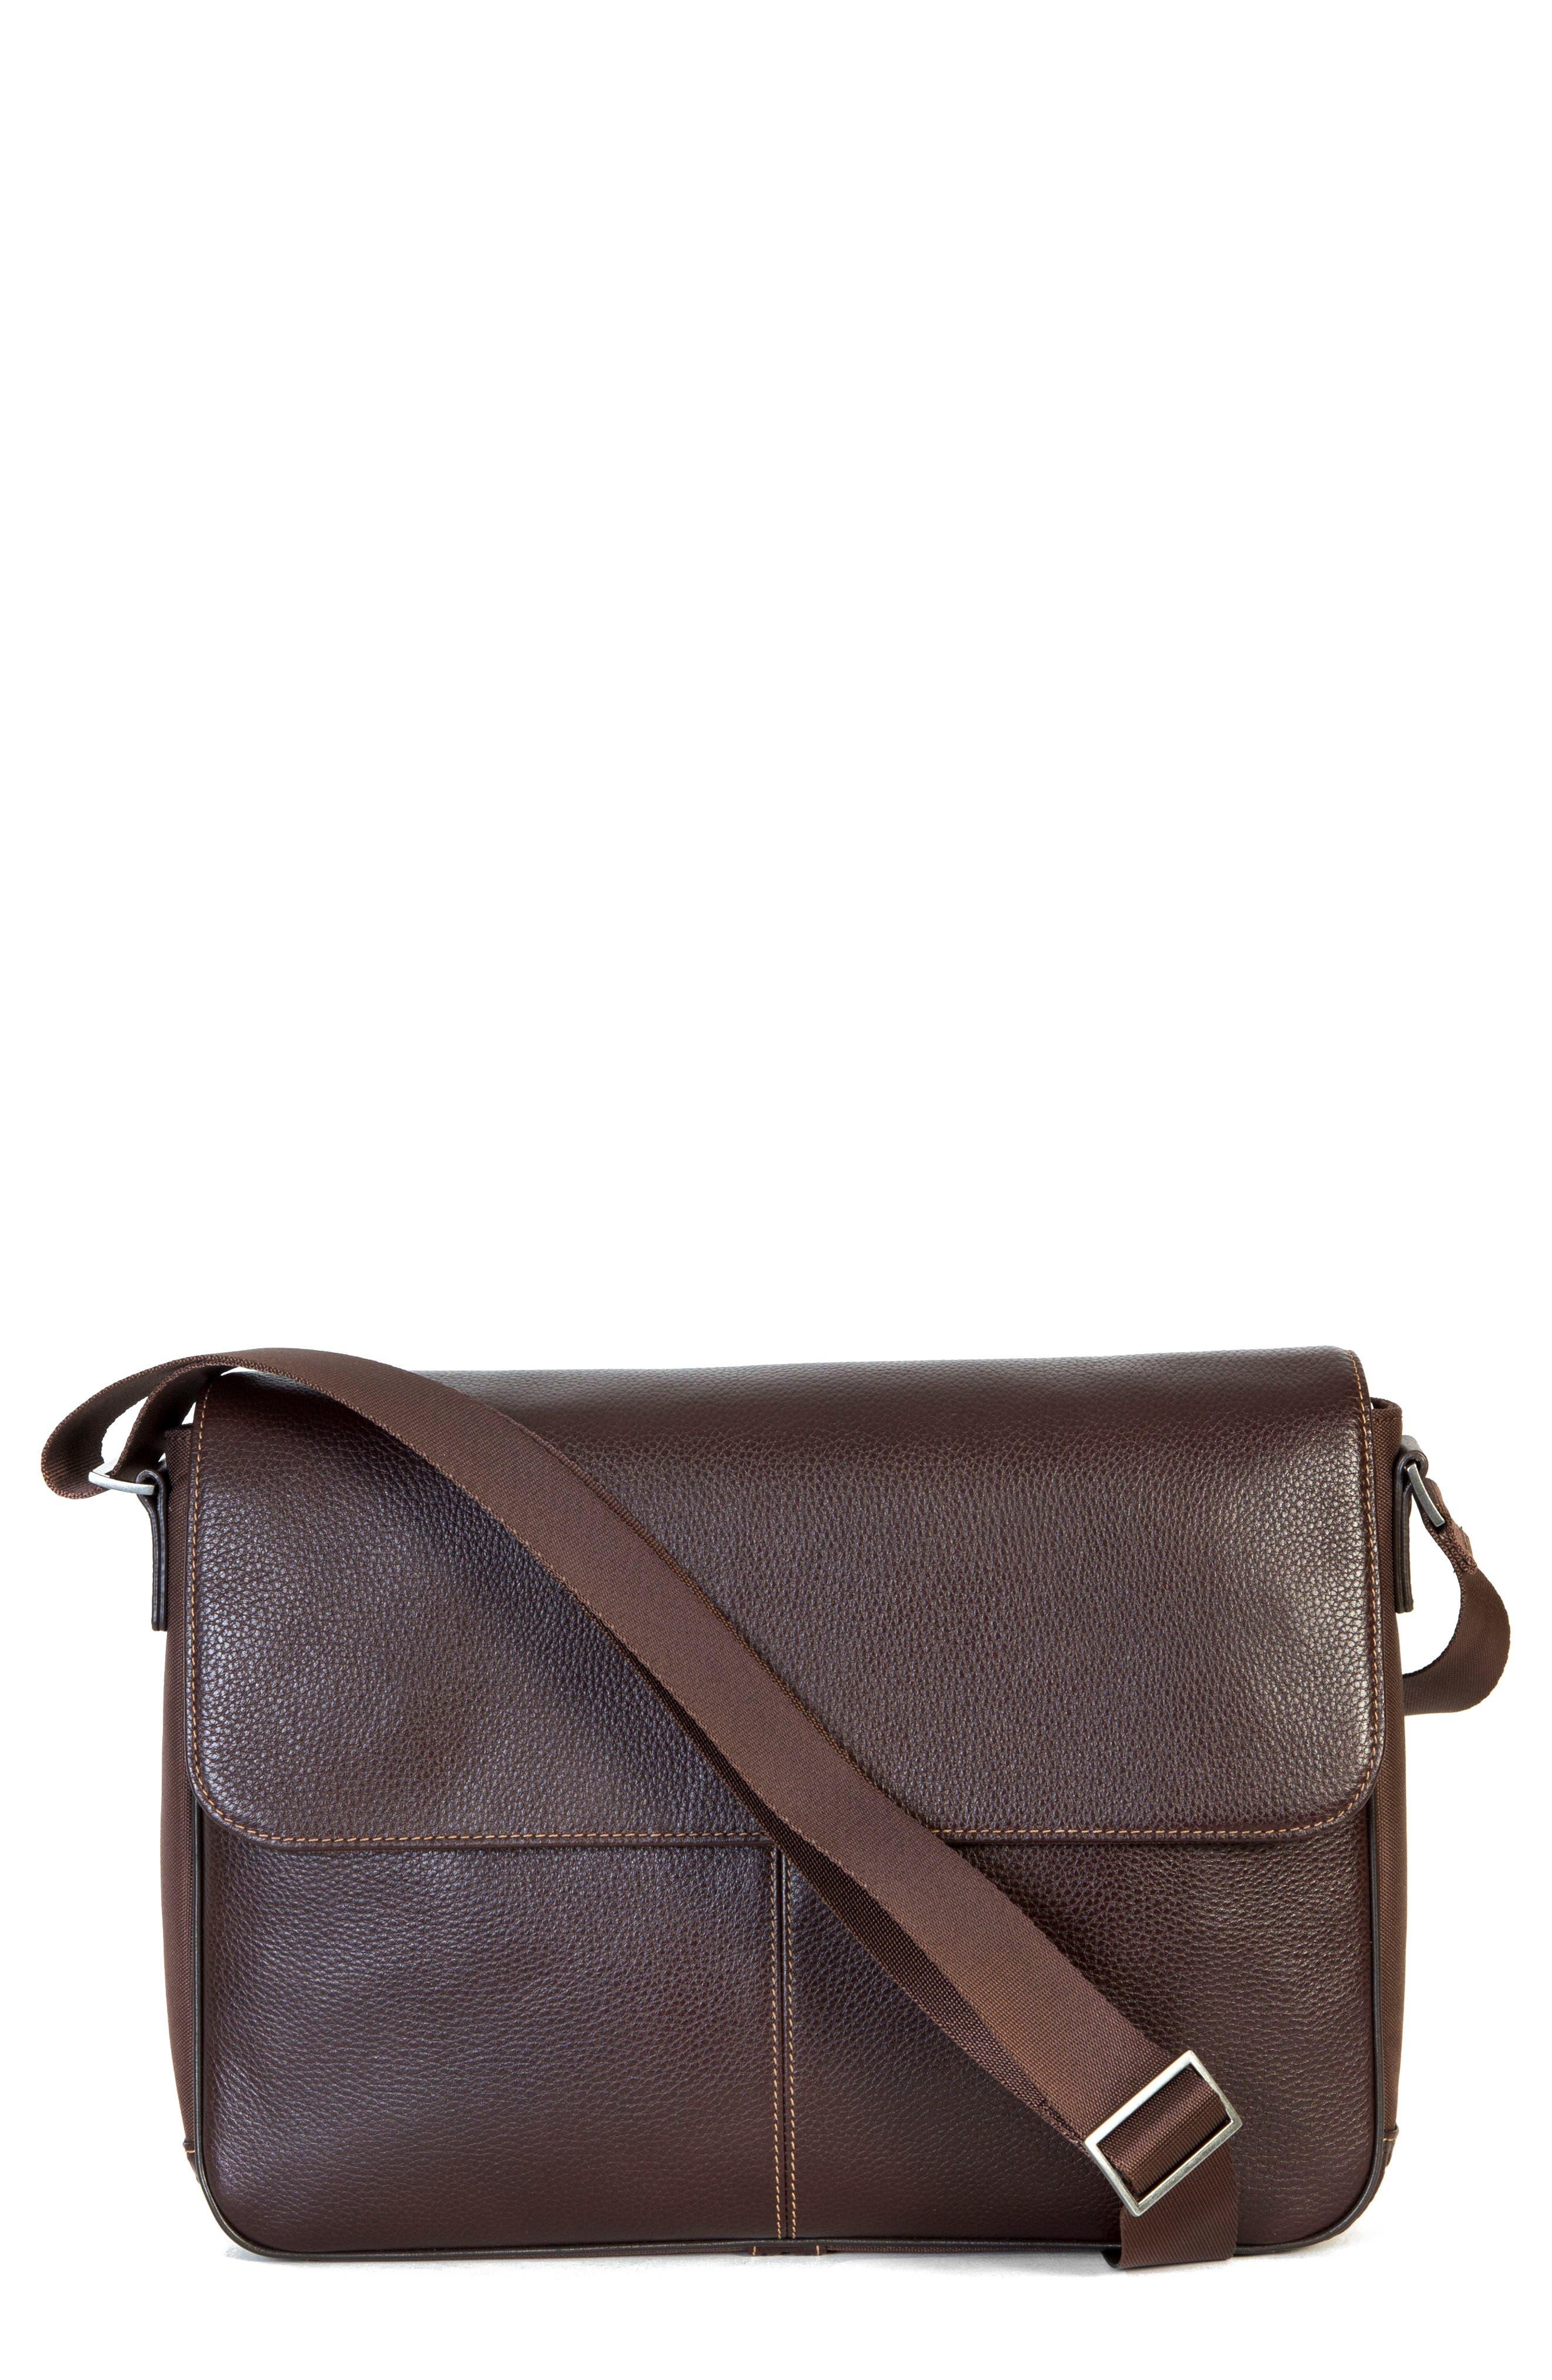 Mens Messenger Bags Handbags / Purses / Luggage